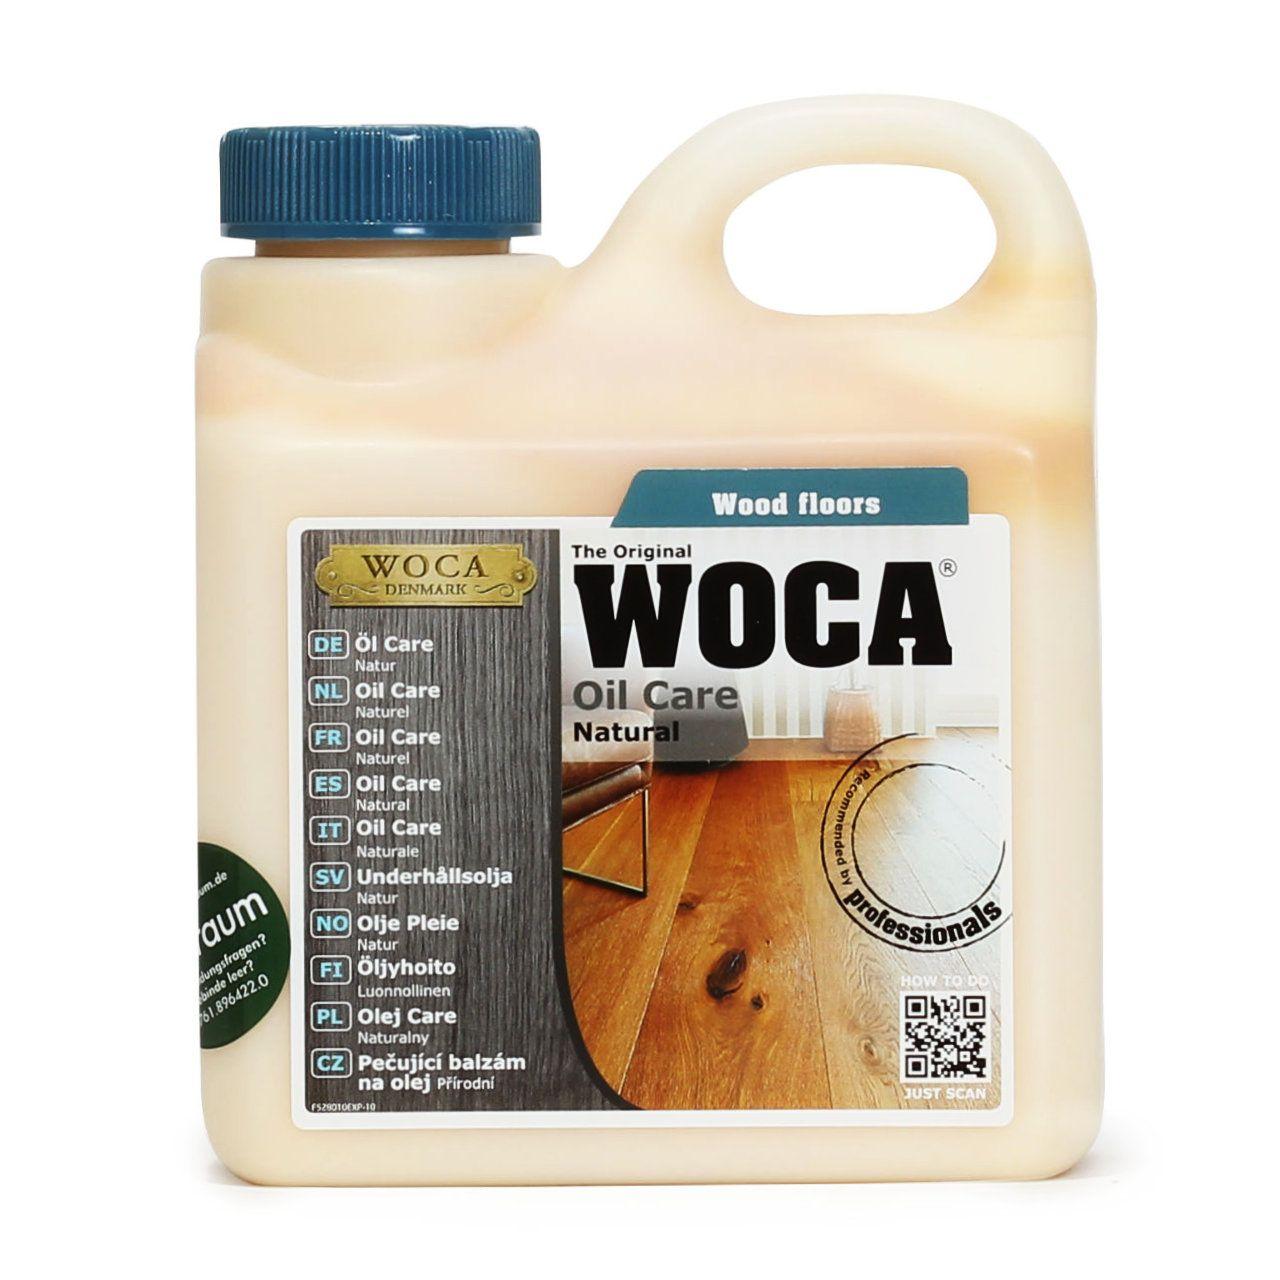 woca-oilcare-natur-1l-quadratisch59789cc3a98f7OOxdYiln395OI